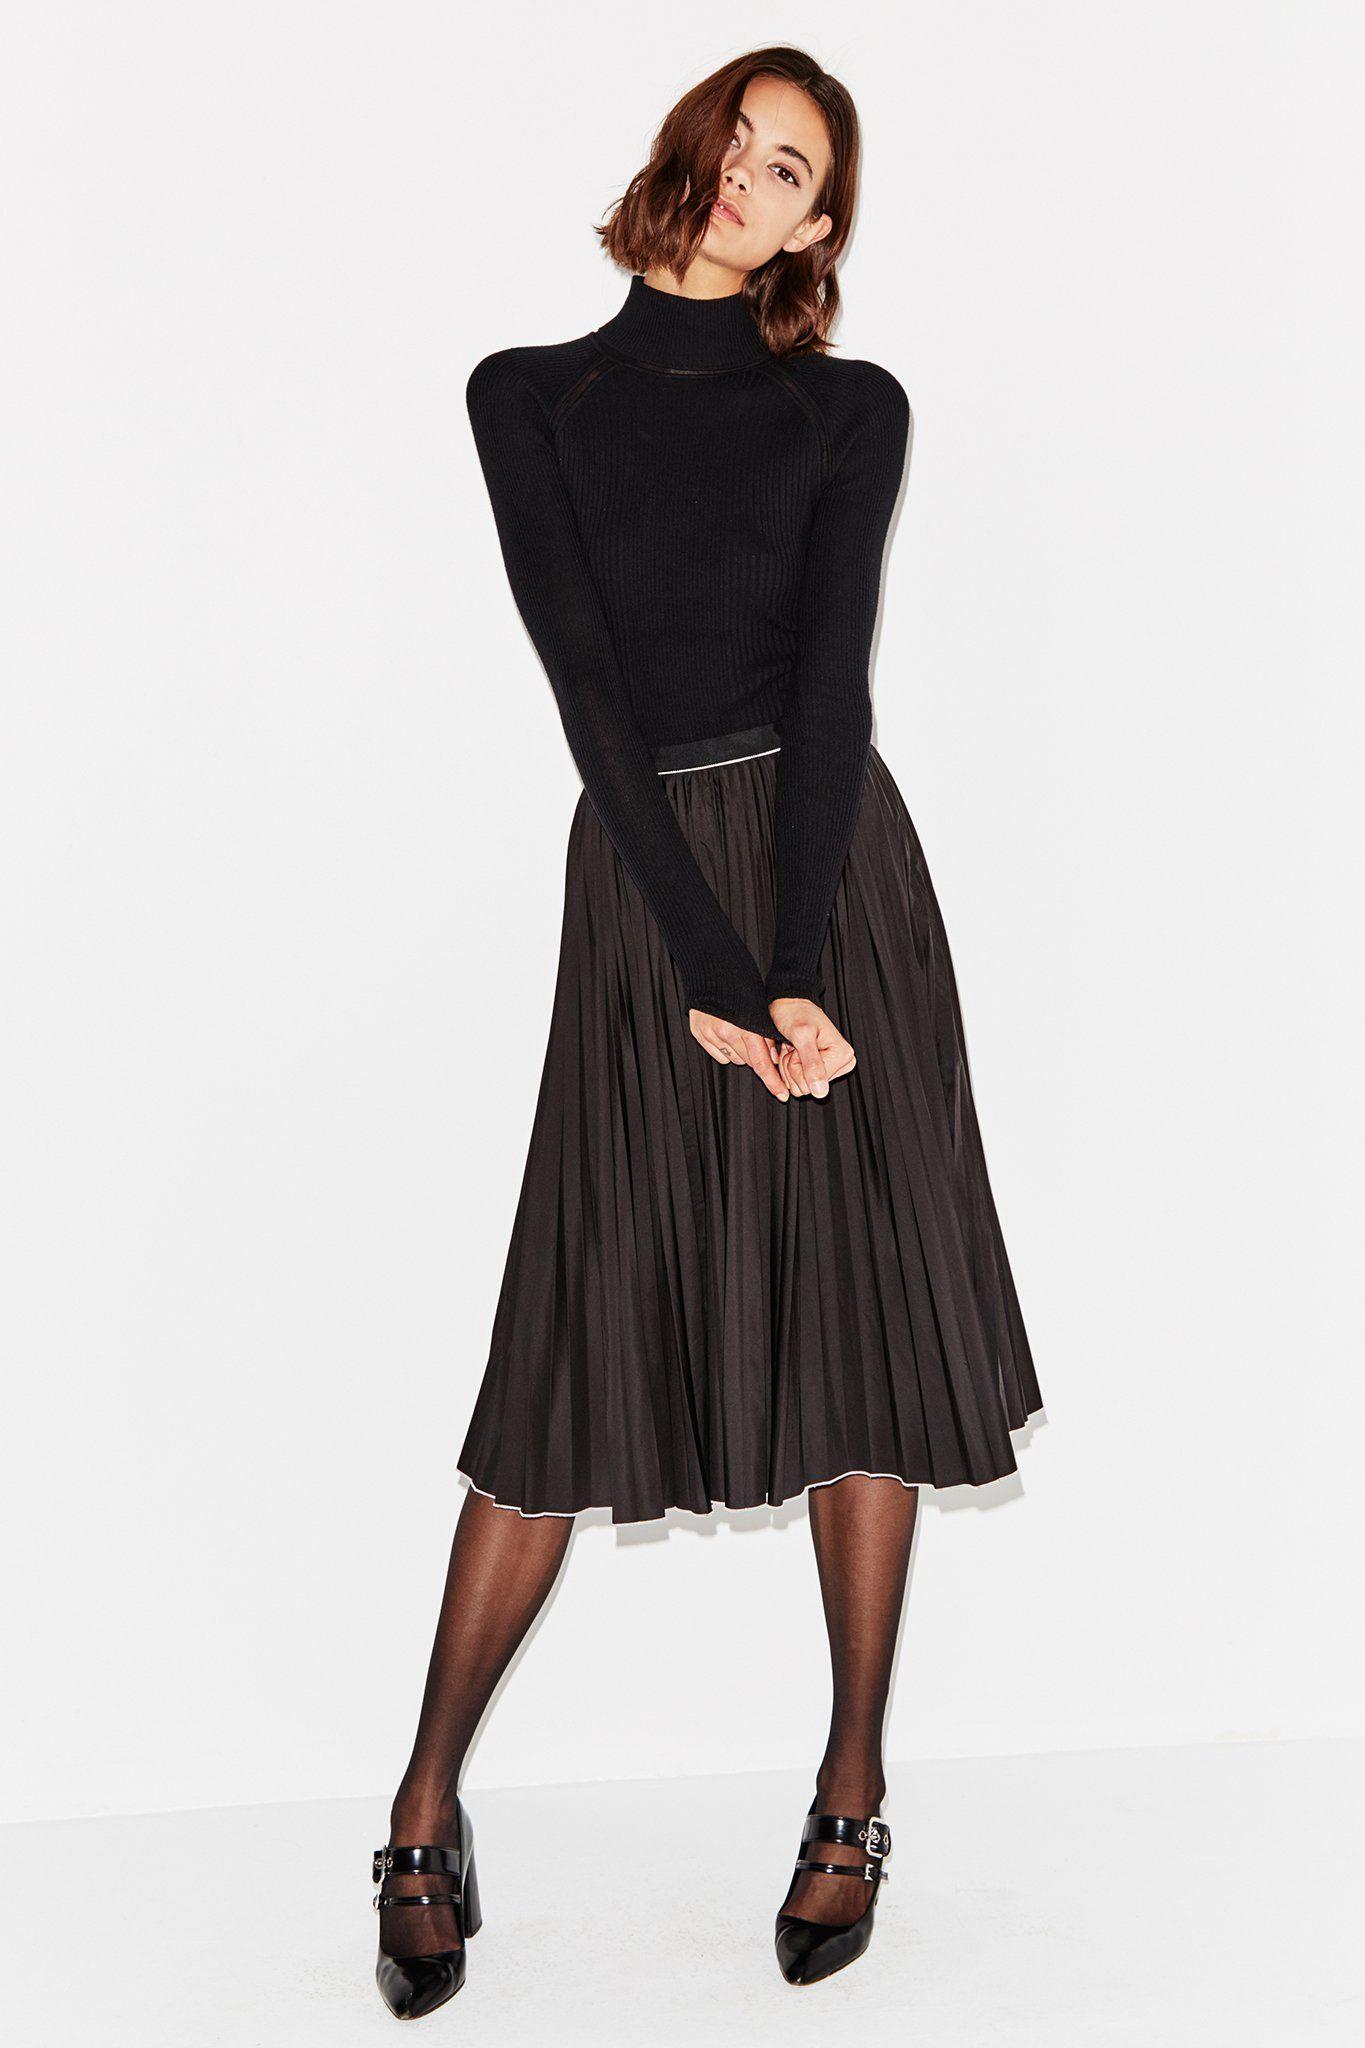 Misha Nonoo Saturday Skirt Black Chiffon Skirt Outfit Black Chiffon Skirt Black Pleated Skirt Outfit [ 2048 x 1365 Pixel ]